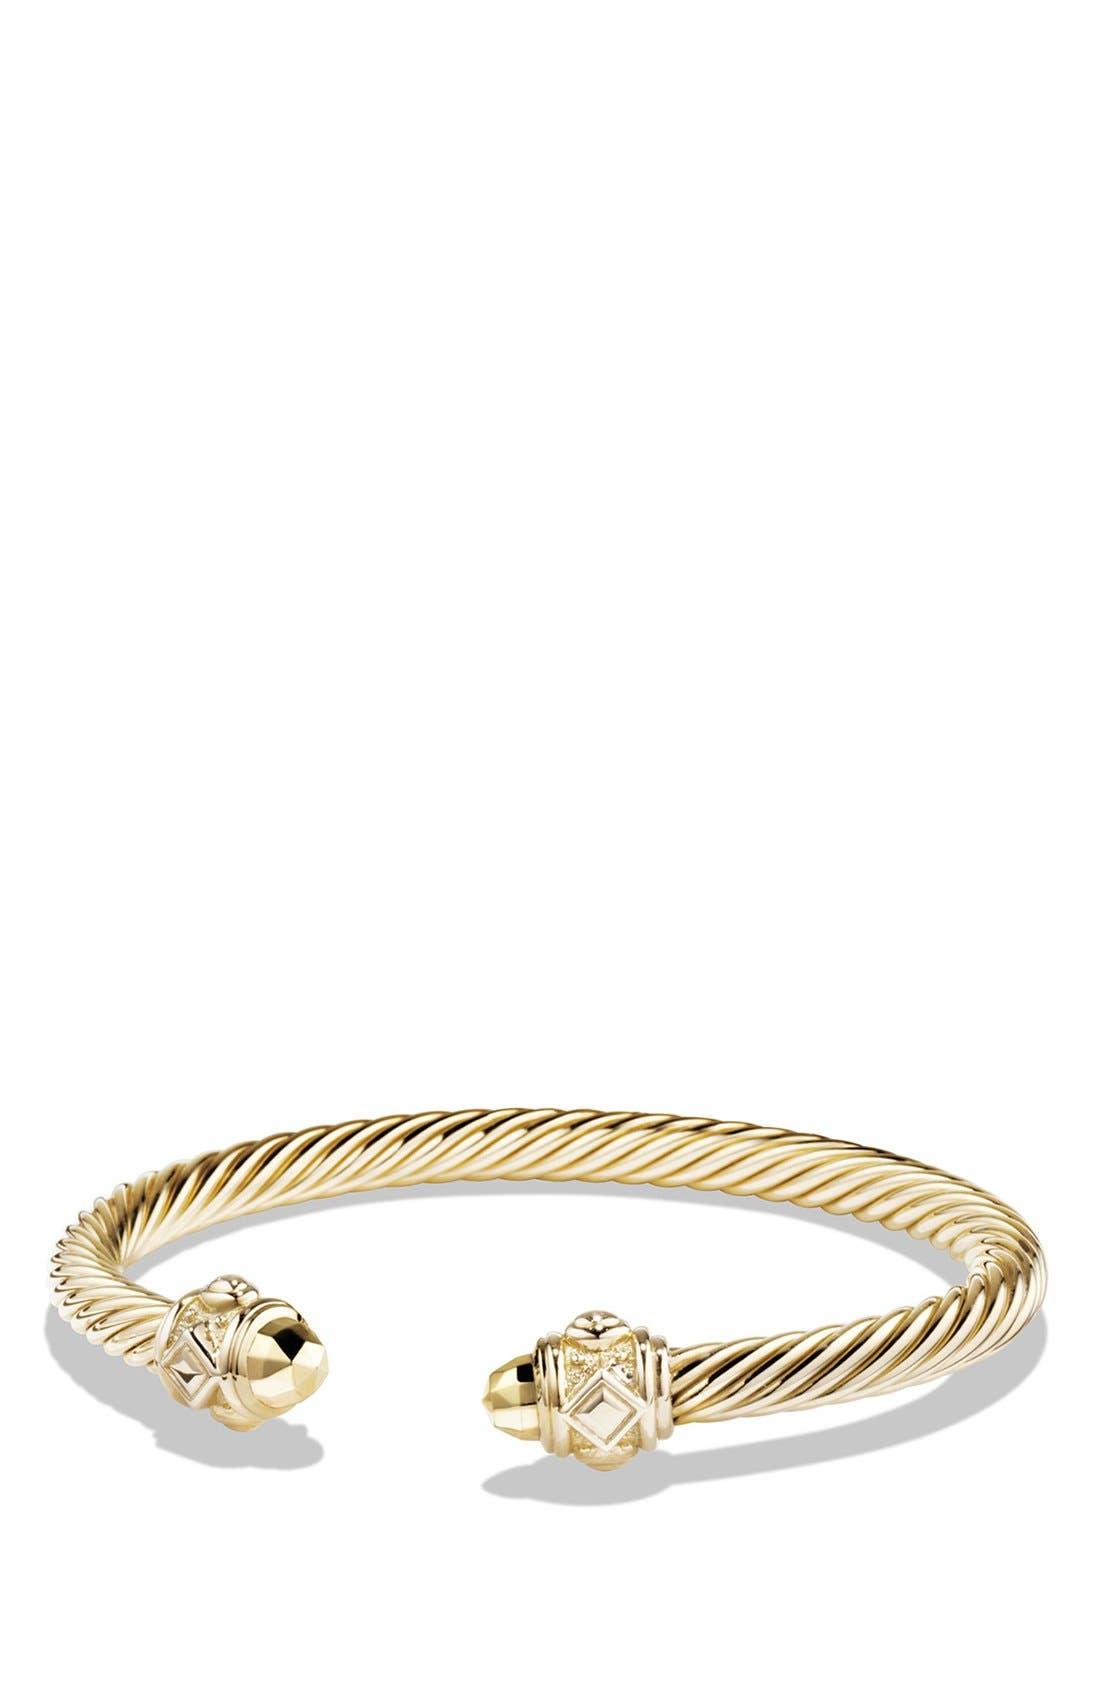 DAVID YURMAN Renaissance Bracelet in 18k Gold